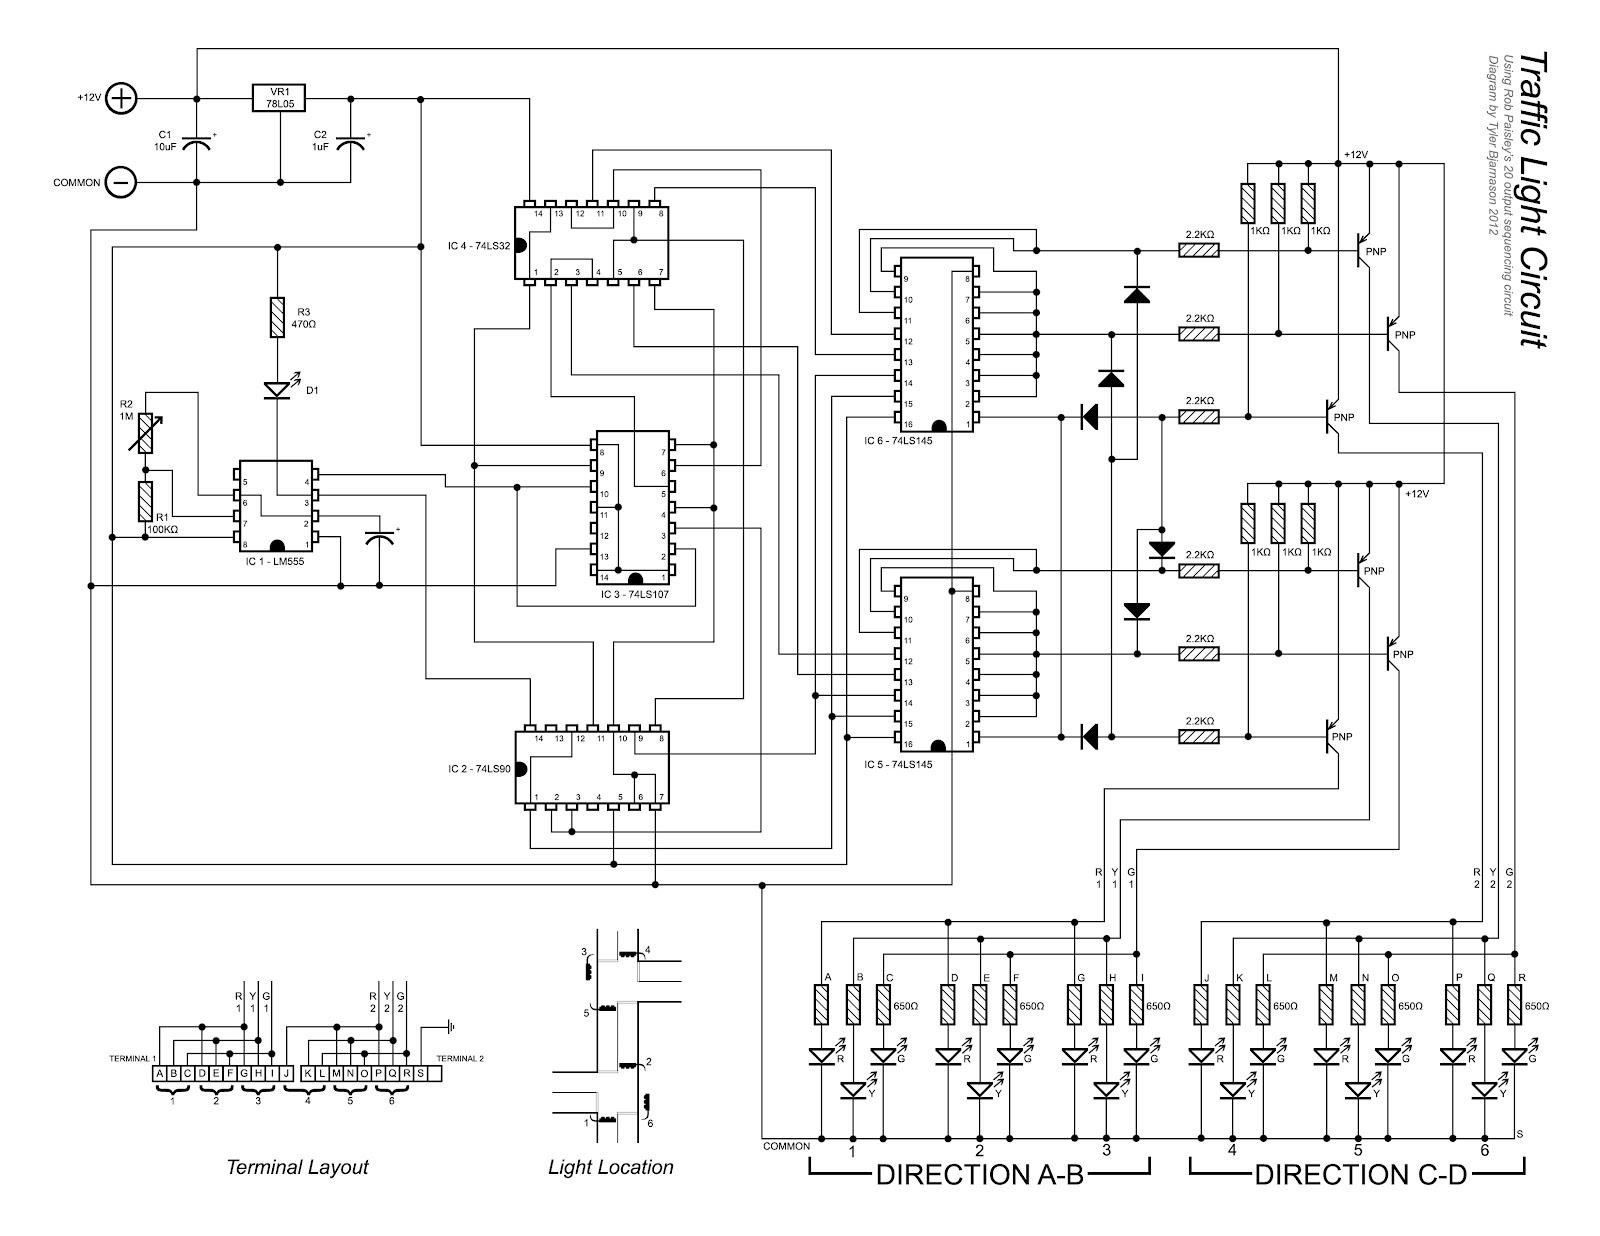 traffic light signal controller wiring diagrams